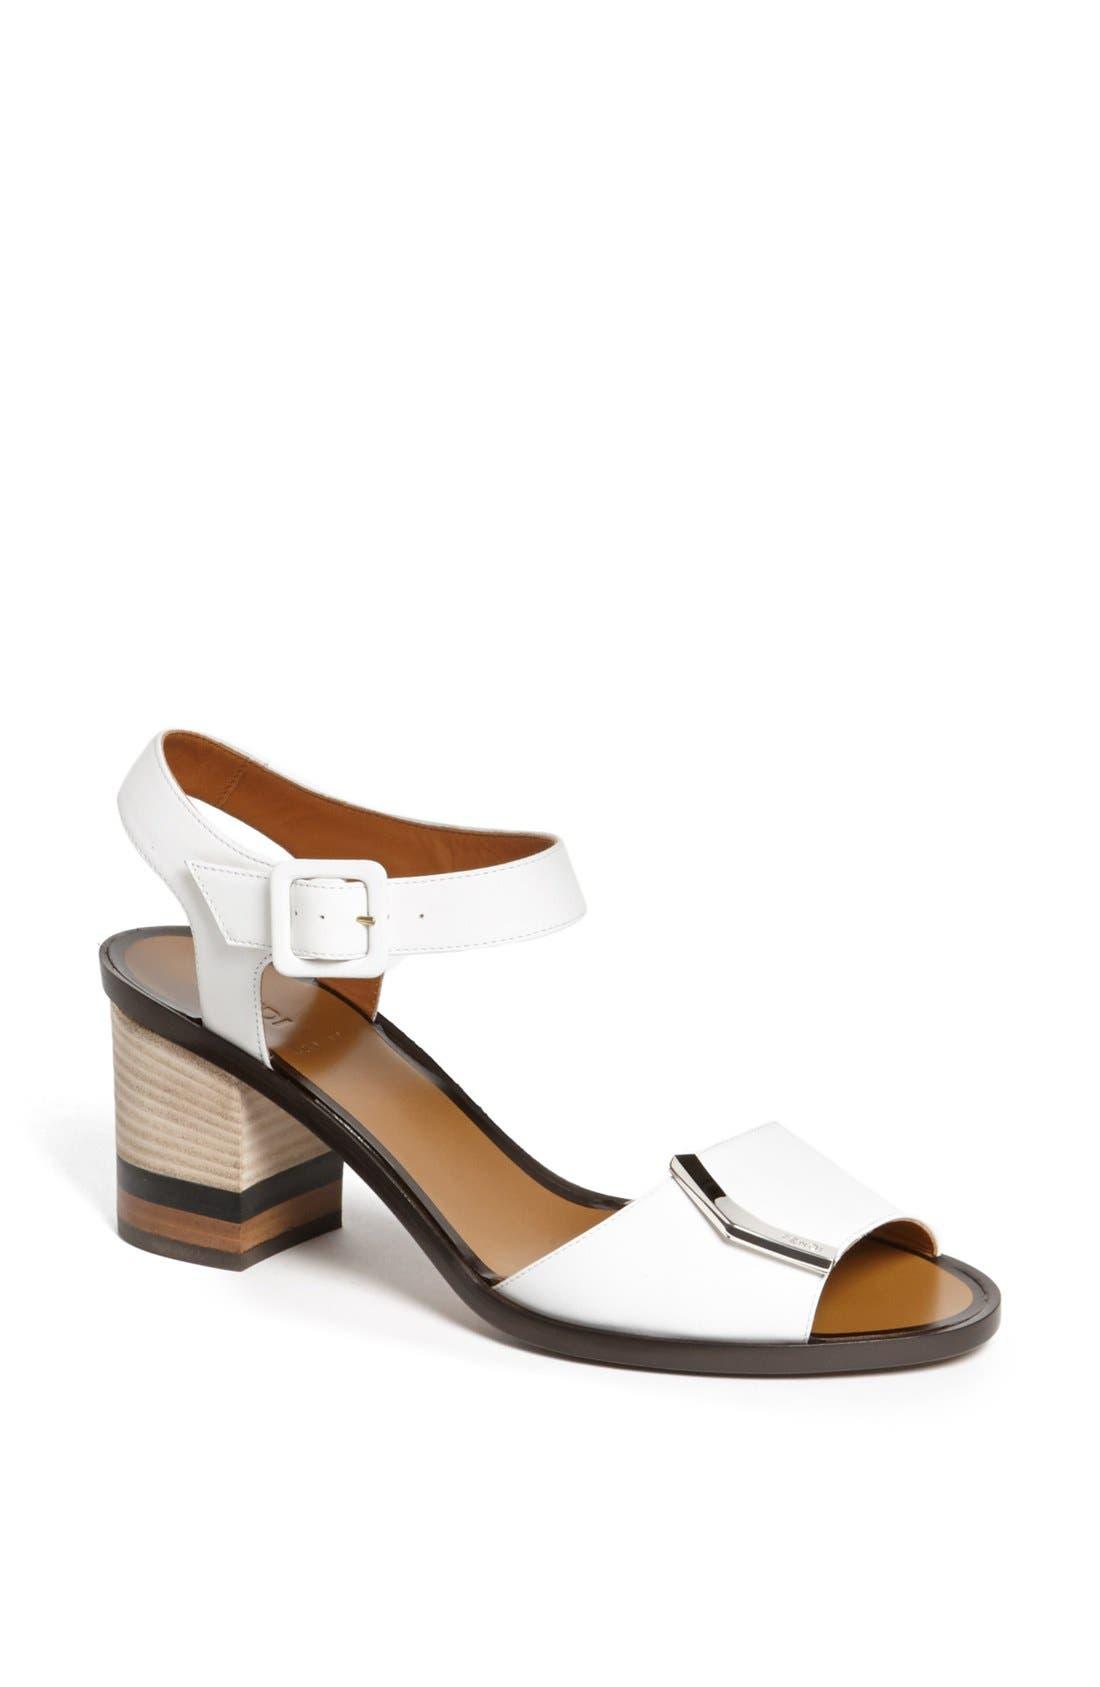 Main Image - Fendi 'Demetra' Block Heel Sandal